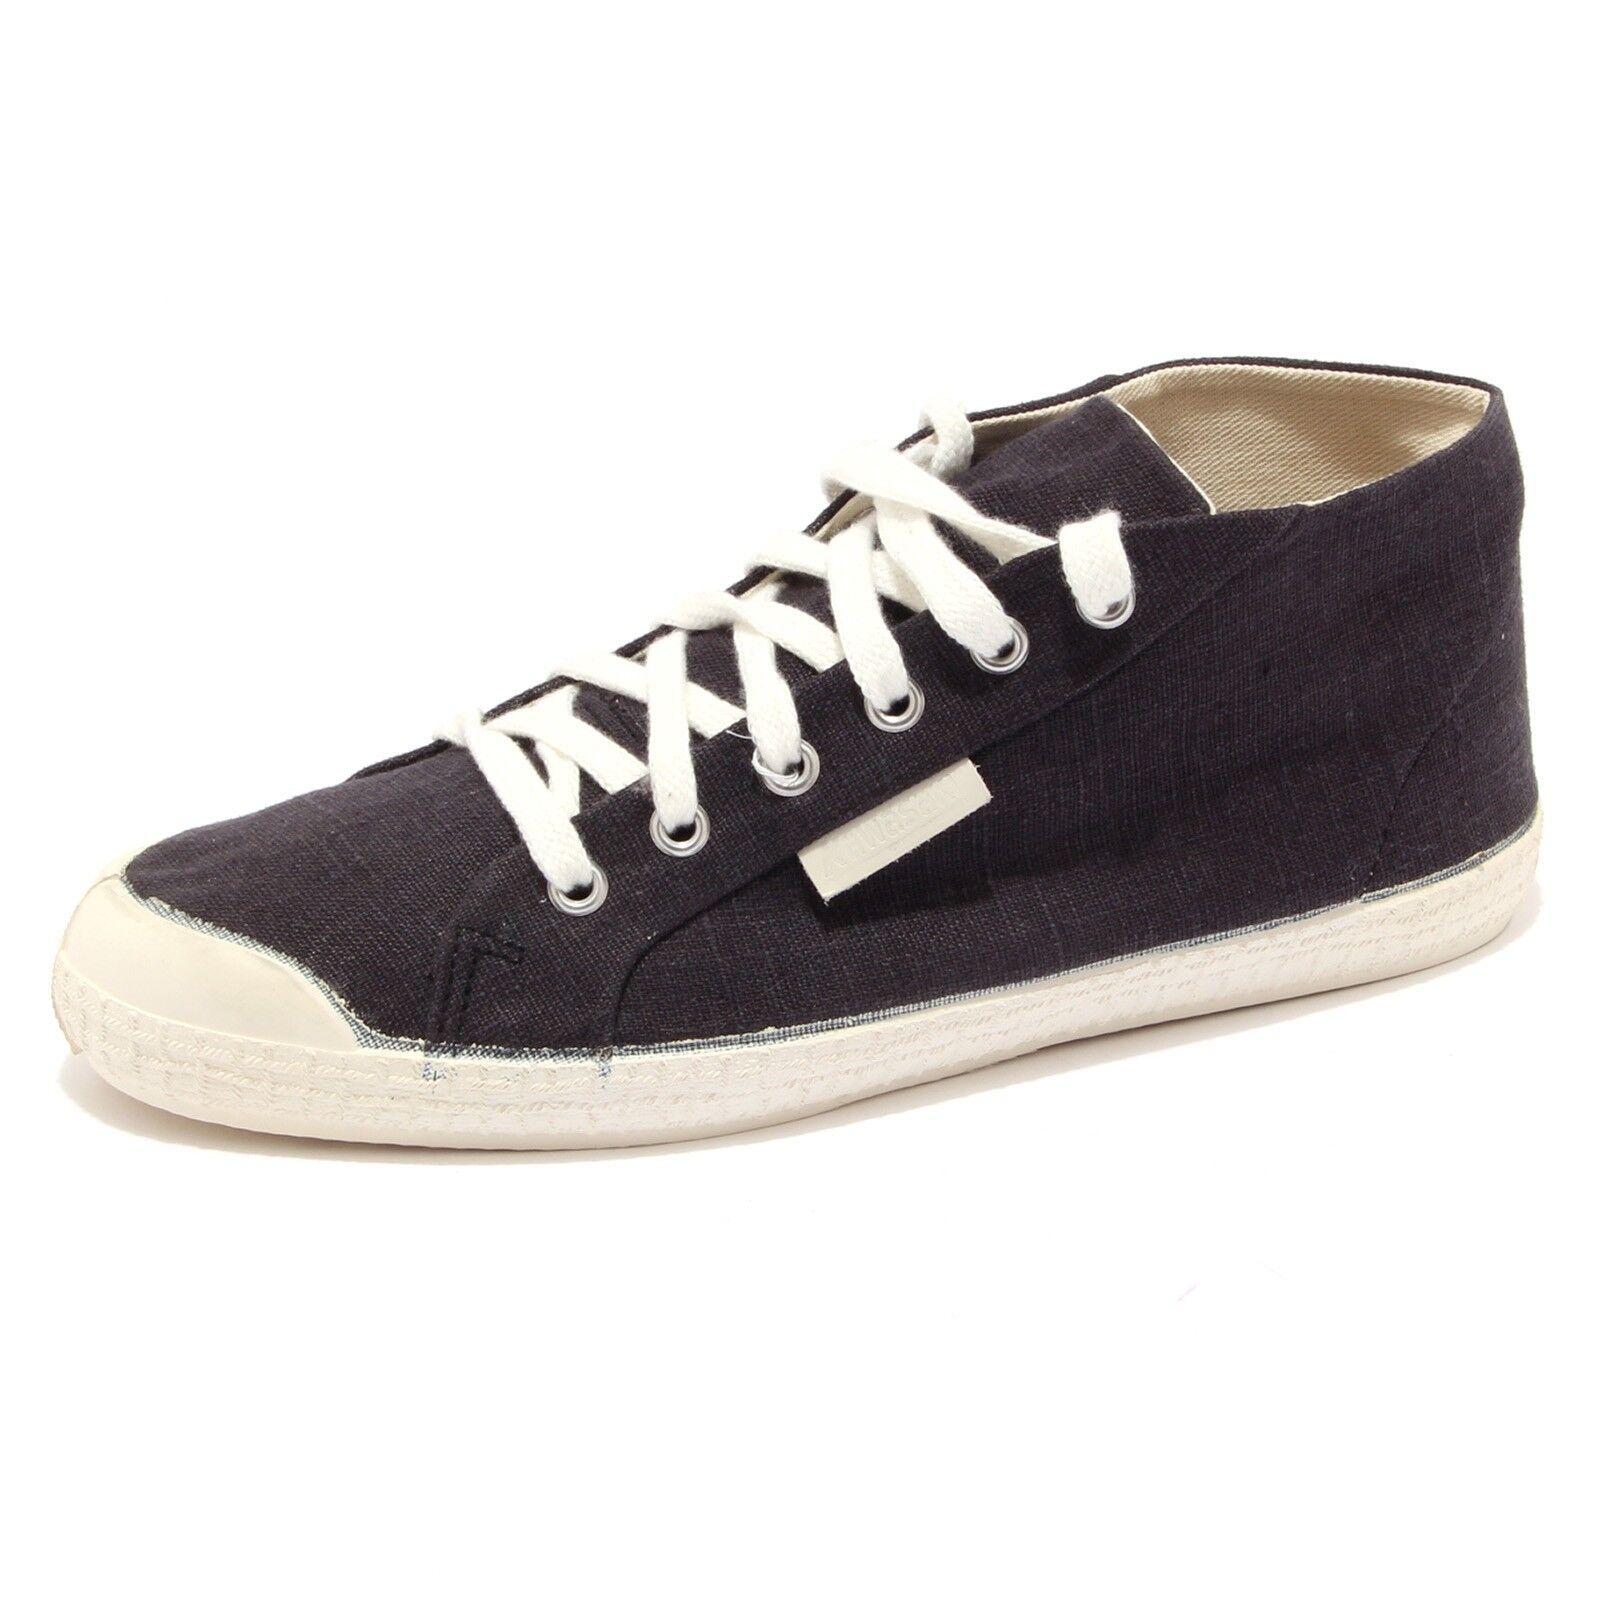 33982 sneaker KAWASAKI WHITOUT BOX FLAX HIGHT 24 scarpa uomo shoes men